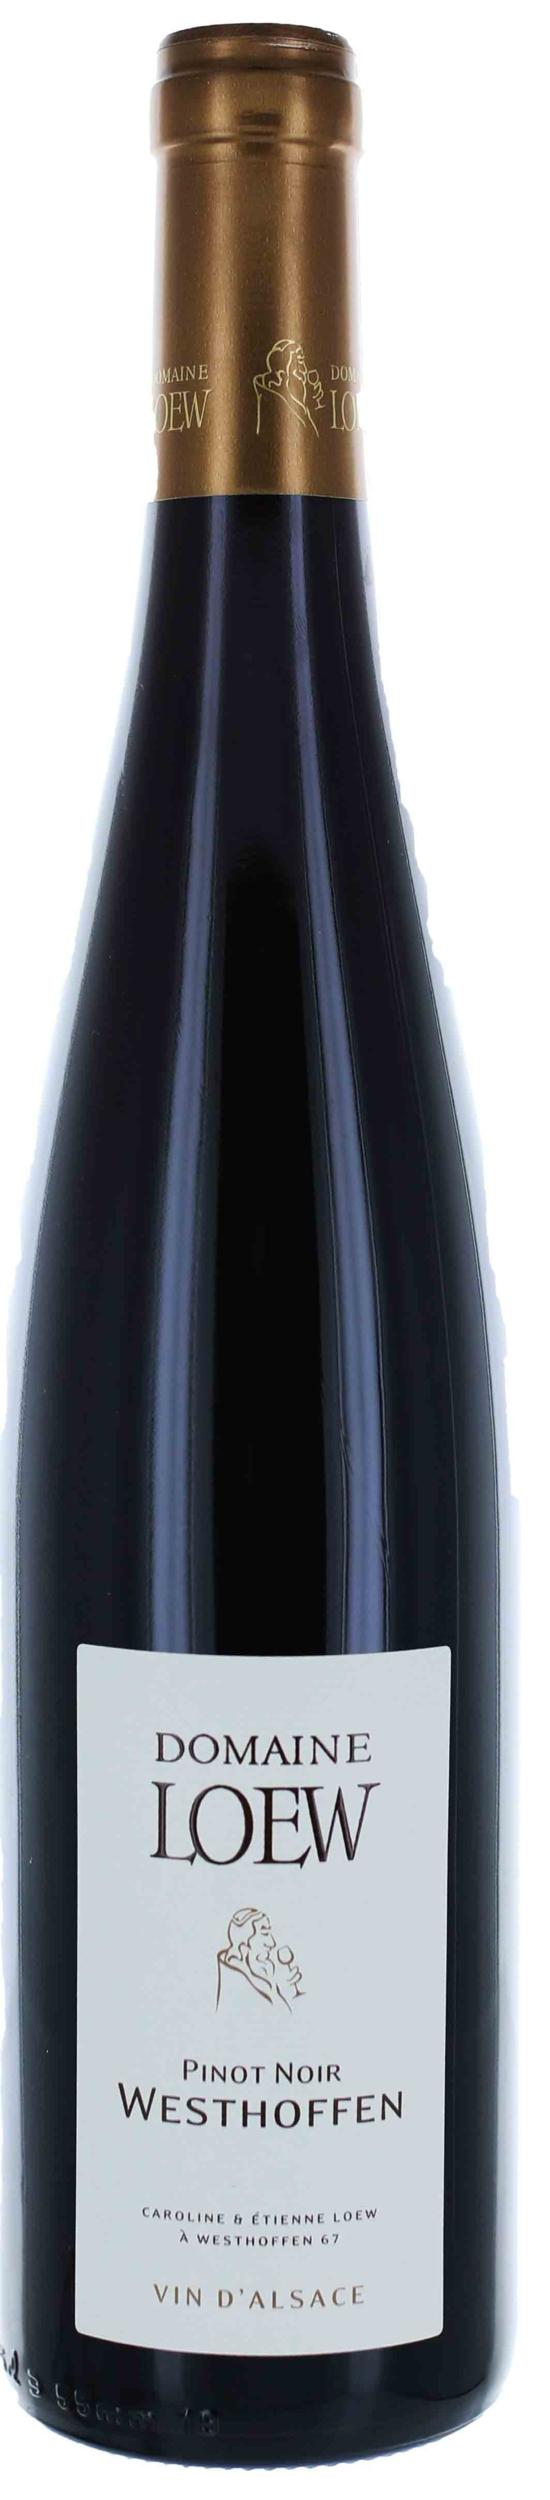 Pinot Noir Westhoffen - Domaine Loew - 2019 - BIO